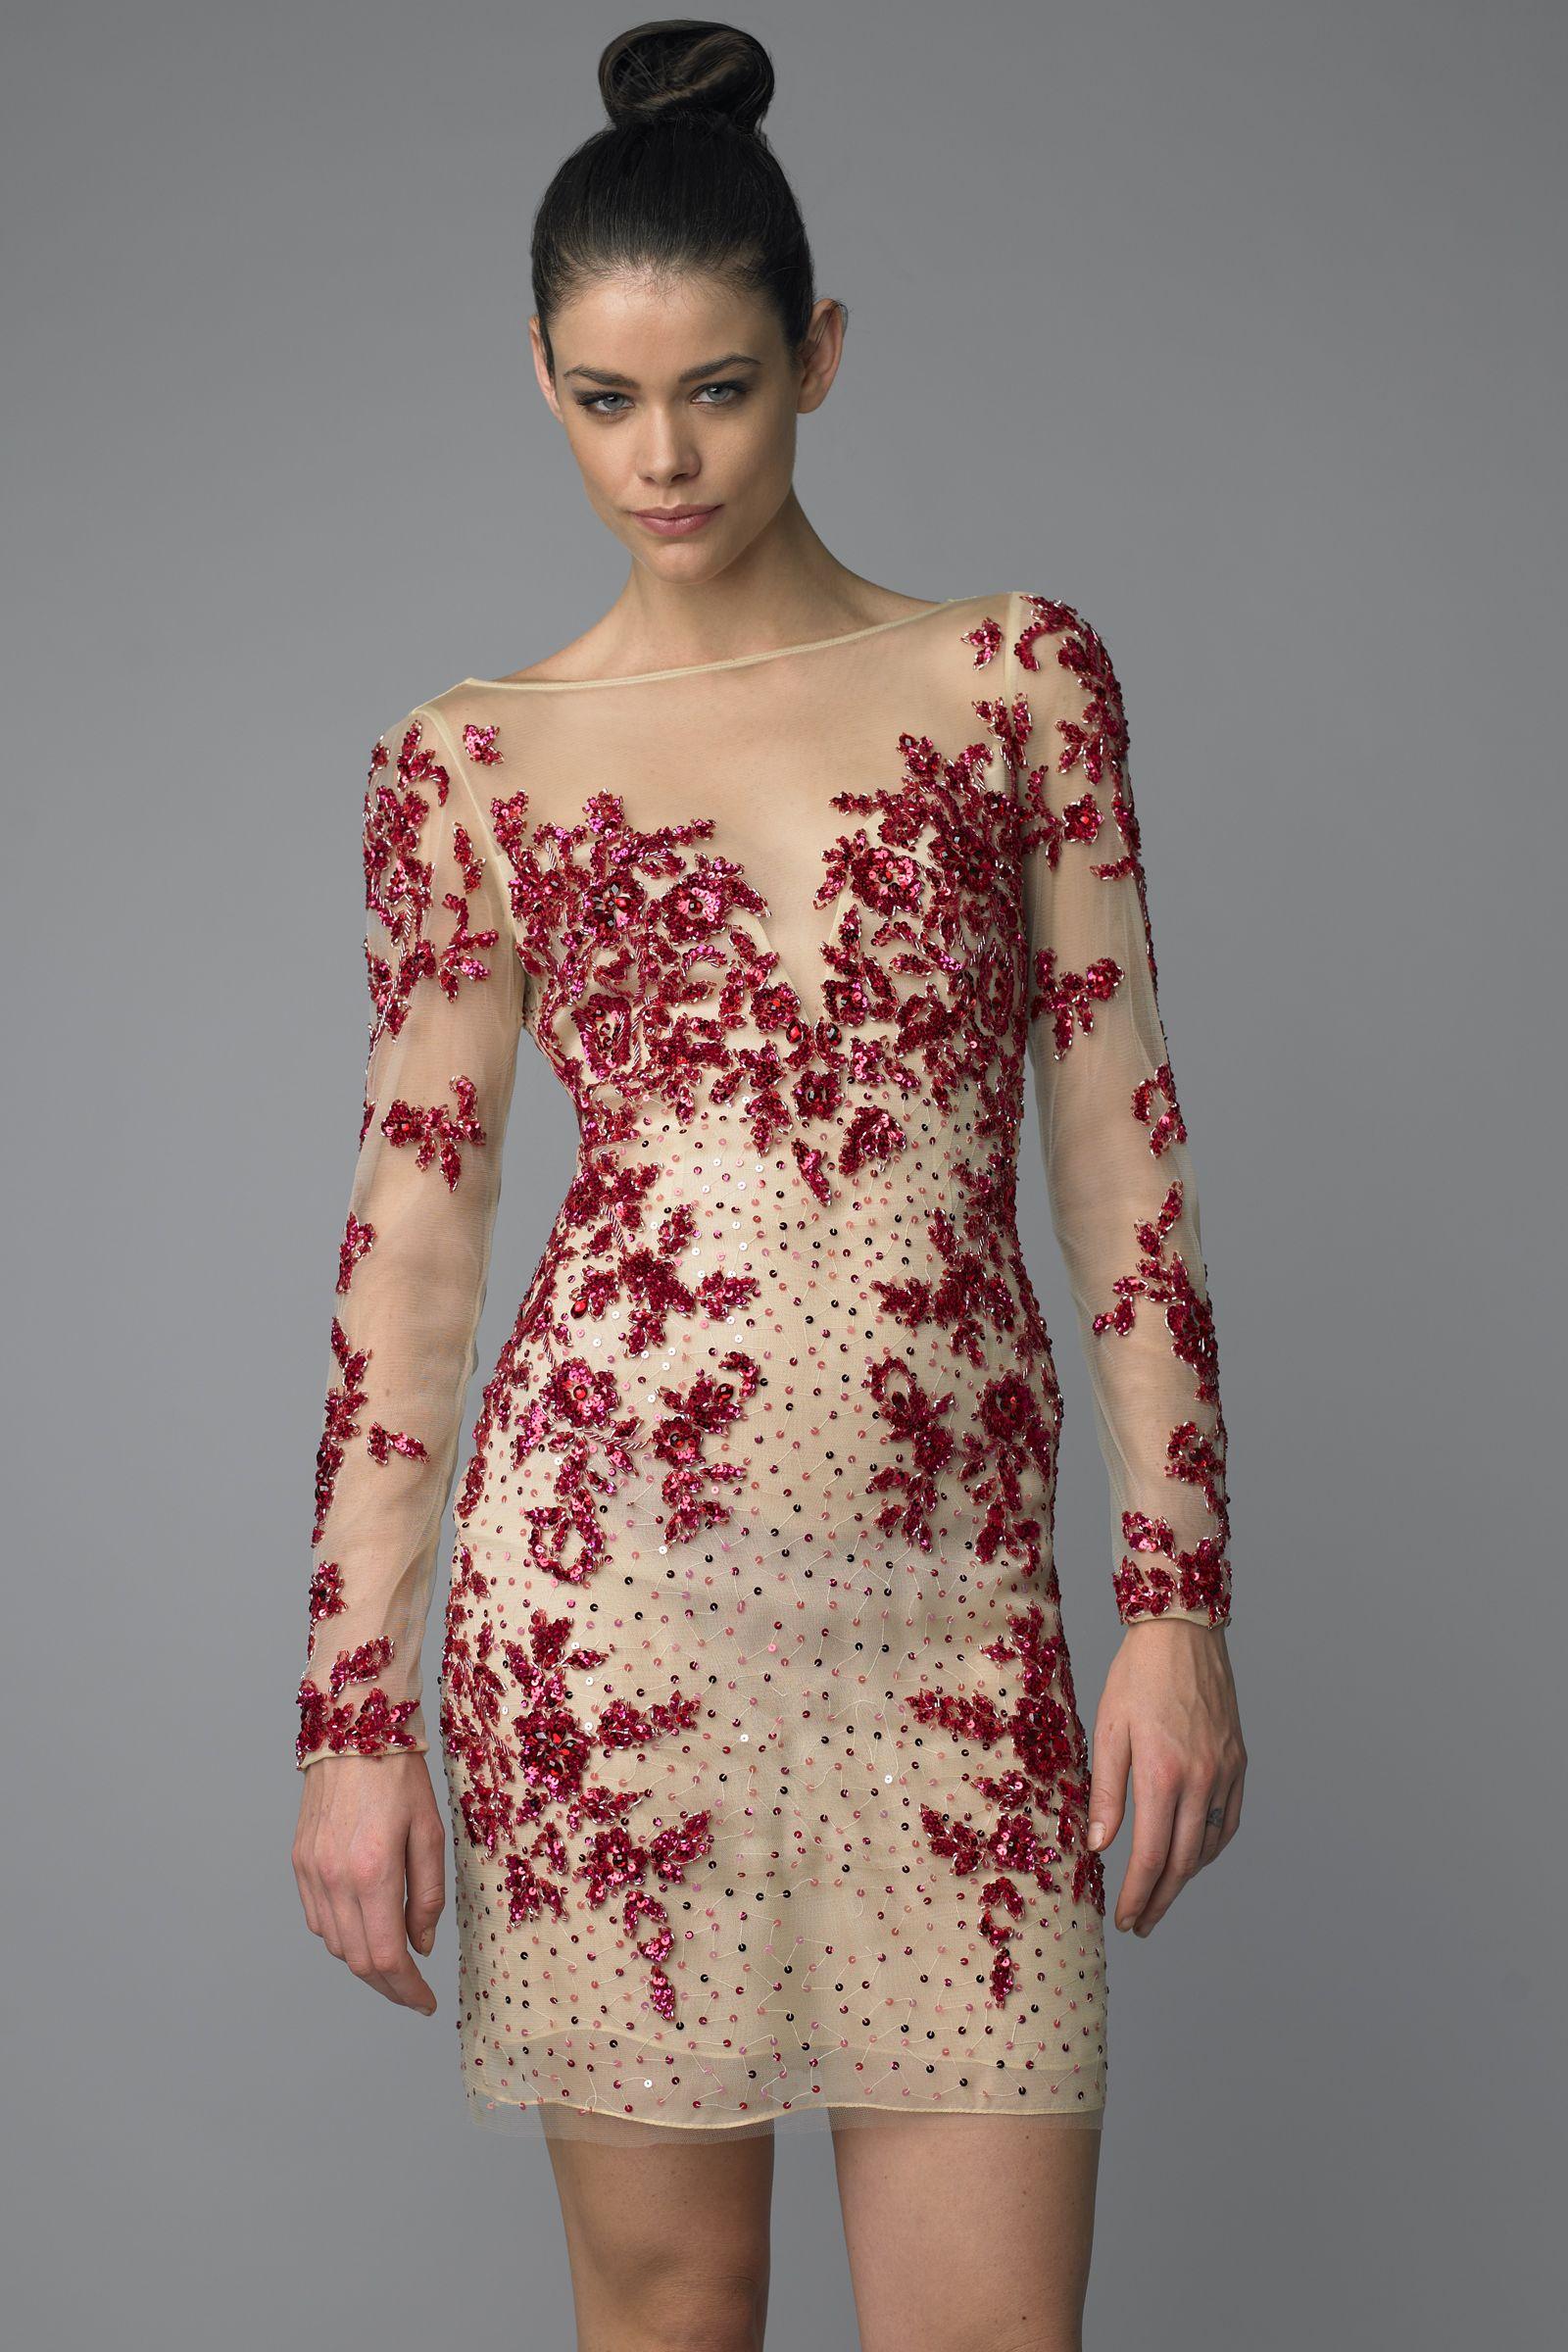 Cocktaildresseslongsleeve best long sleeve cocktail dresses